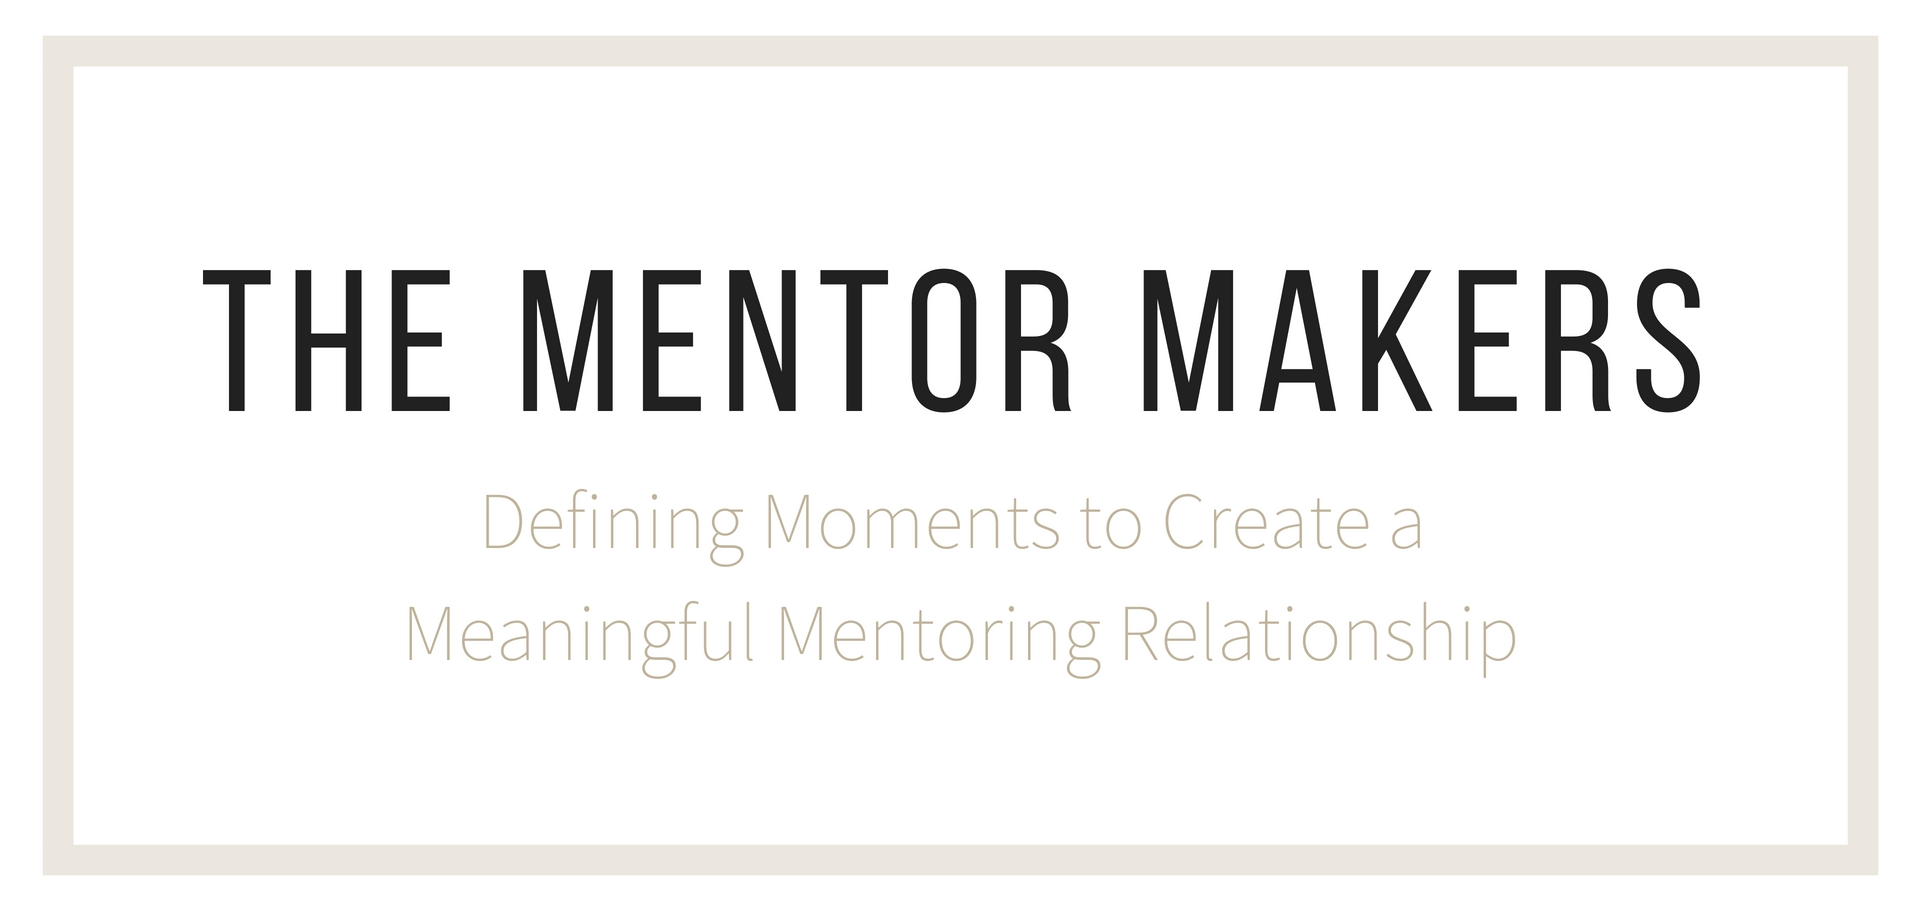 THE MENTOR MAKERS-4.jpg